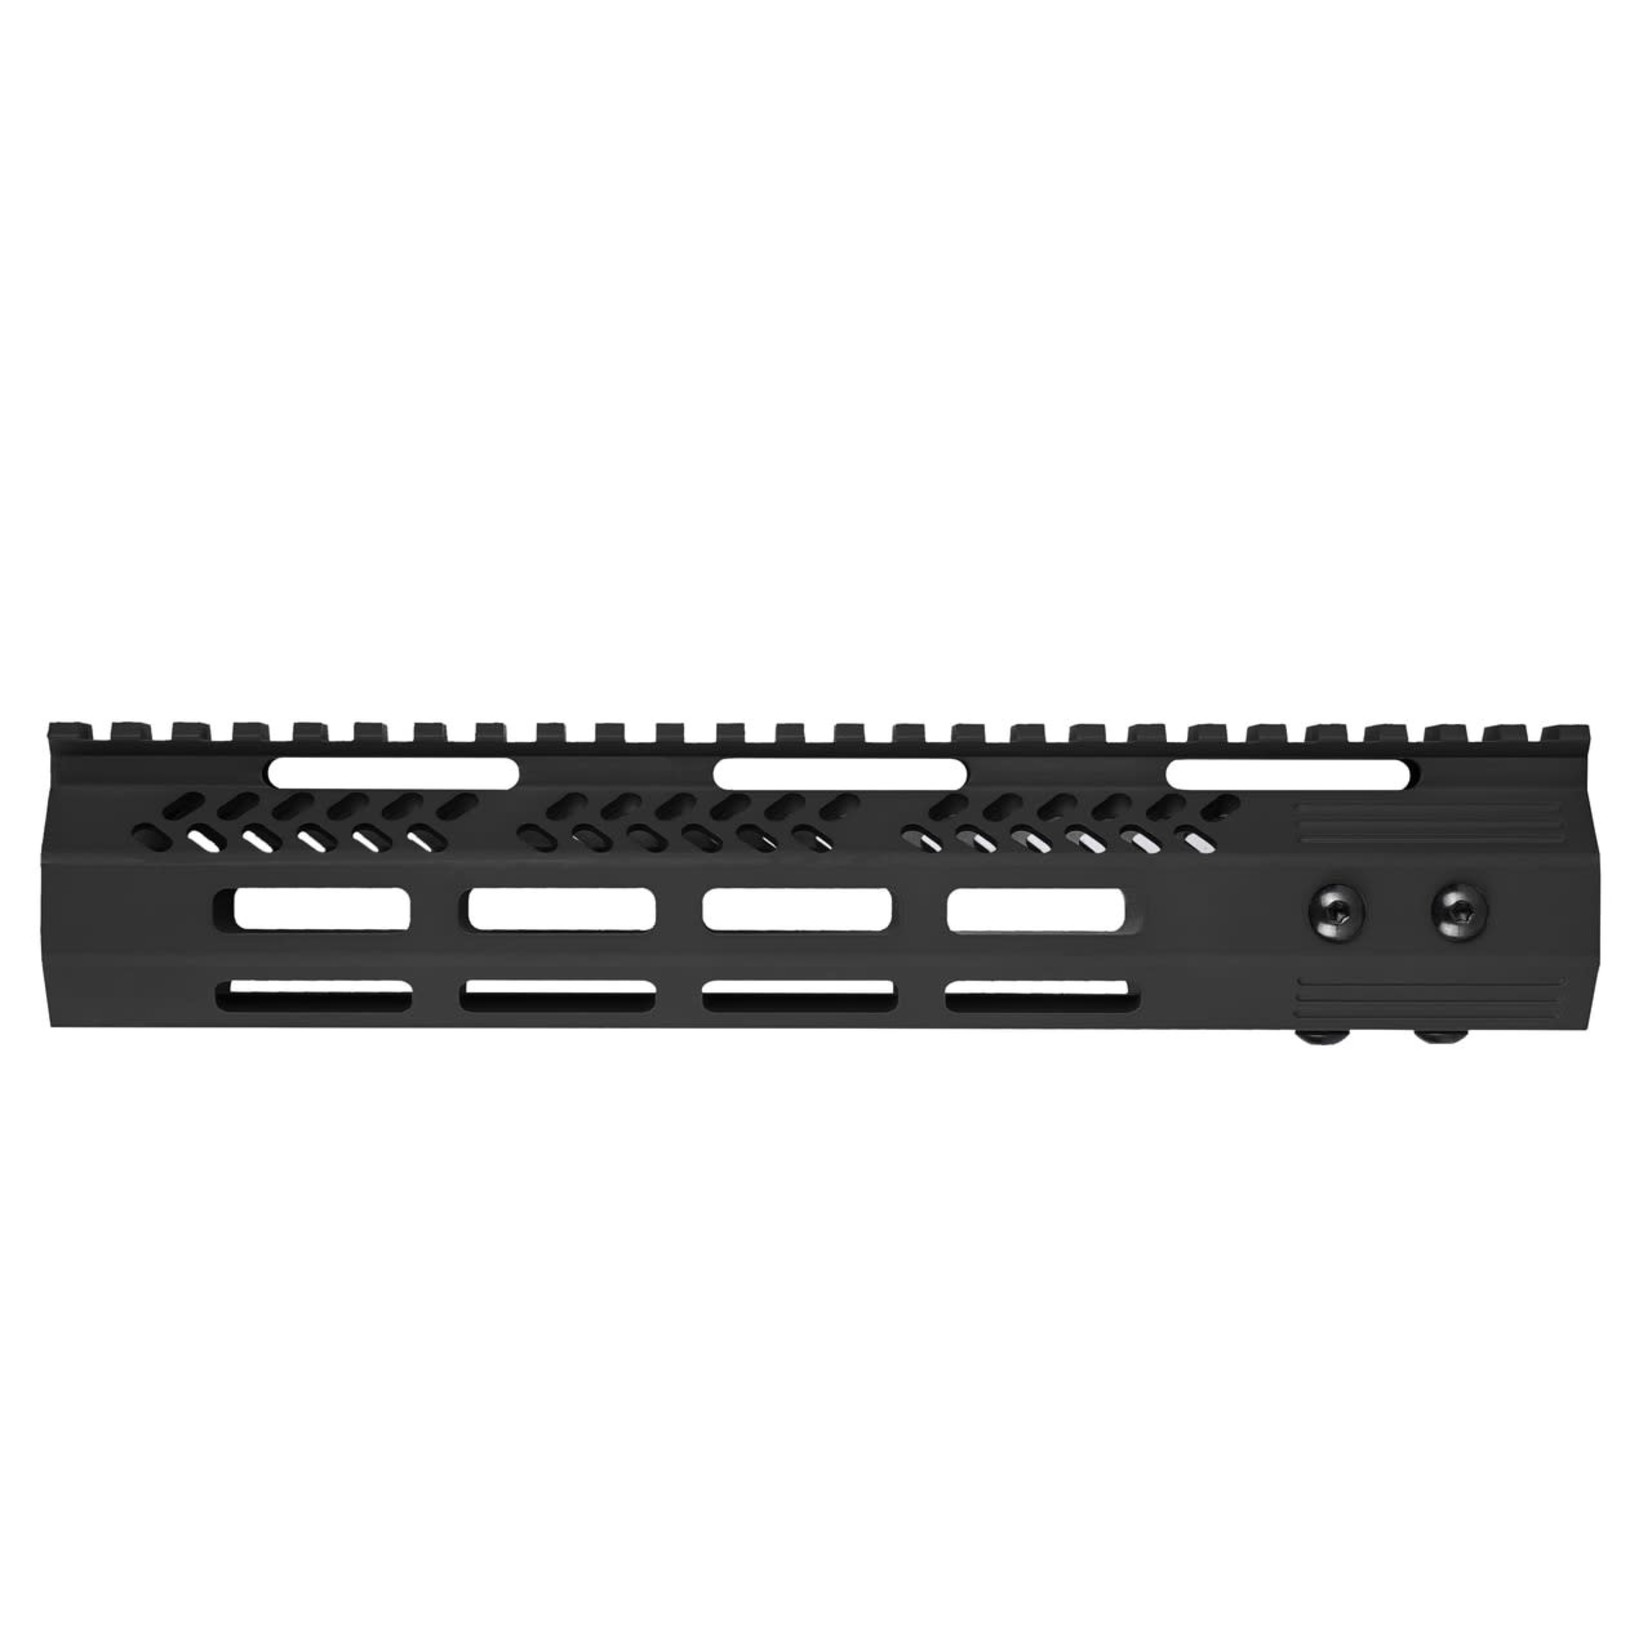 Monstrum Tactical Monstrum AR-15 M-LOK Rail Handguard - 10 inch | Free Float - Series B (Black)